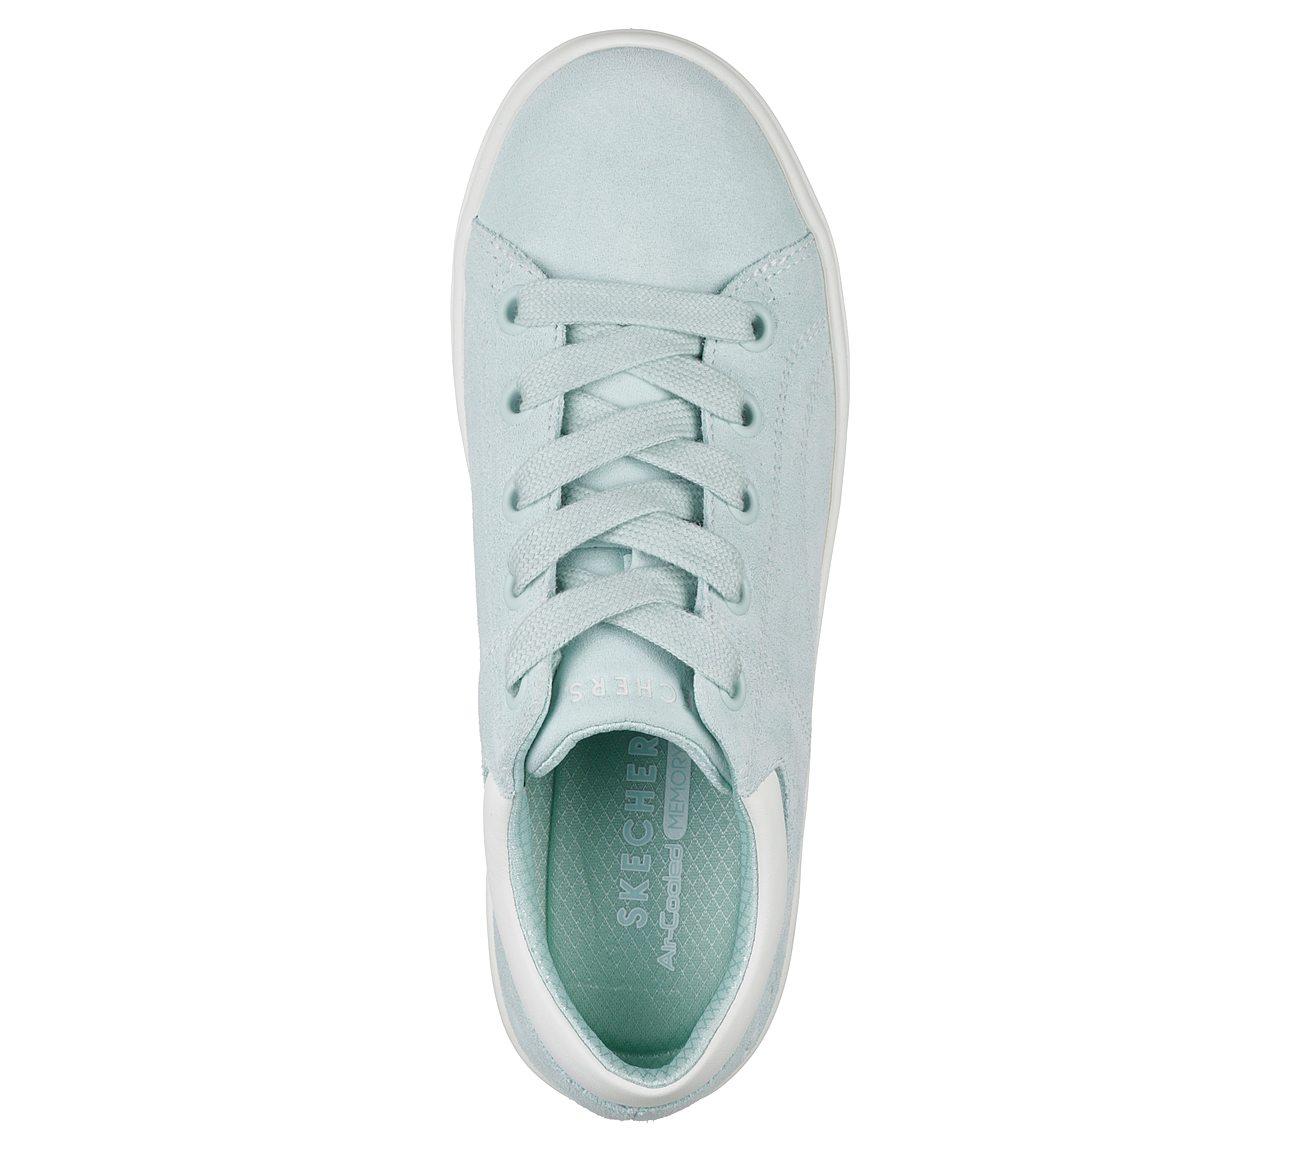 70689c539ba Buy SKECHERS Street Cleat SKECHER Street Shoes only  100.00